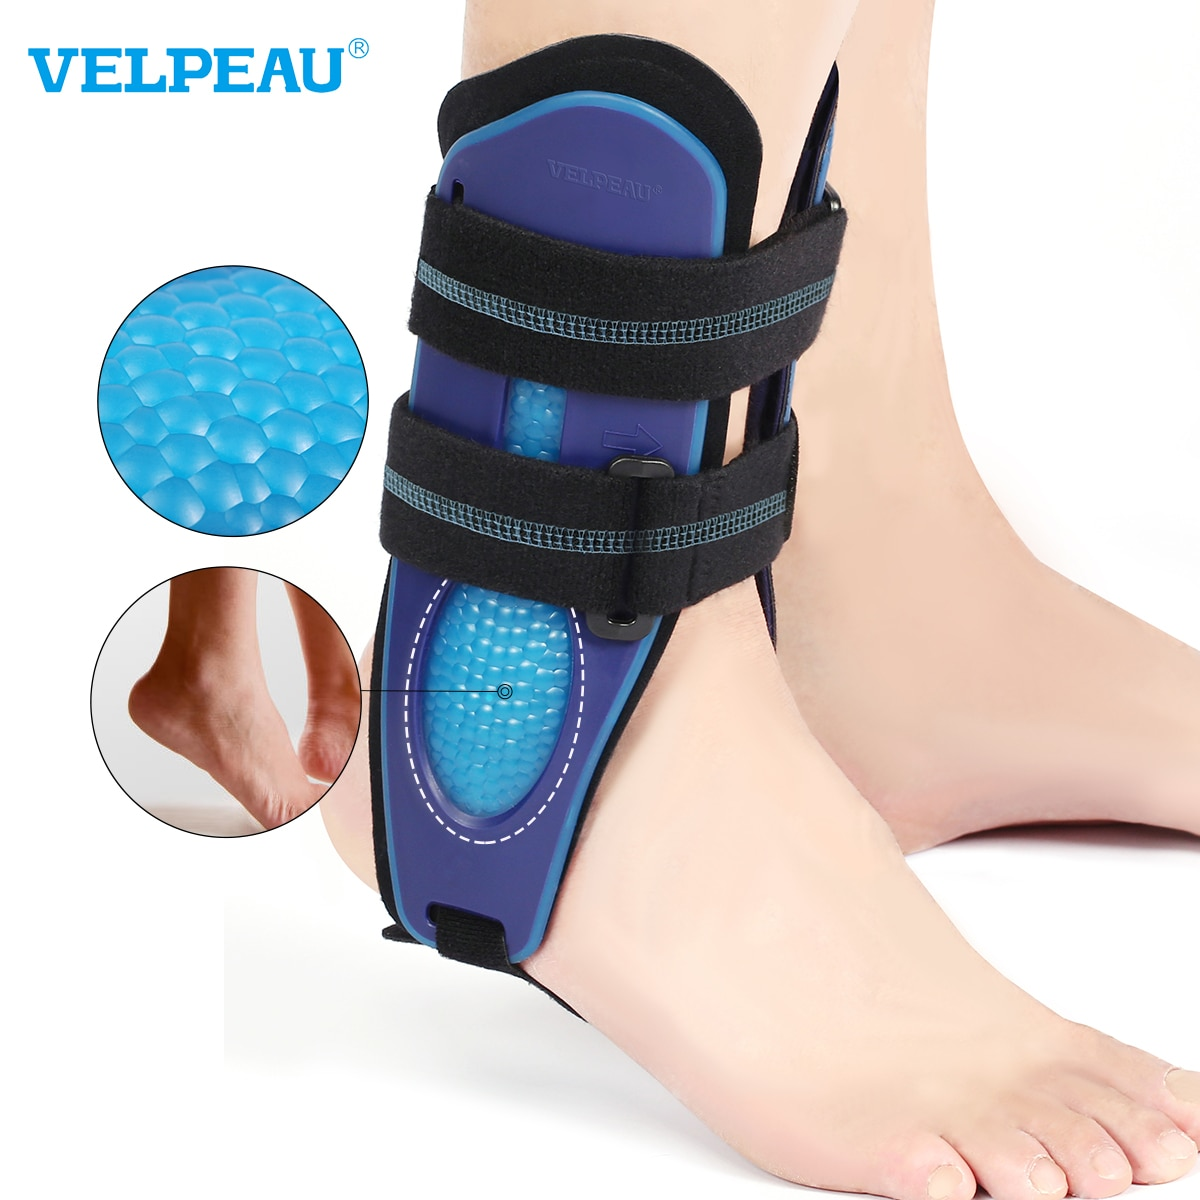 VELPEAU Ankle Support Brace Ankle Brace Stabilizer Stirrup Splint for Sprains Can be Worn in Shoe fo